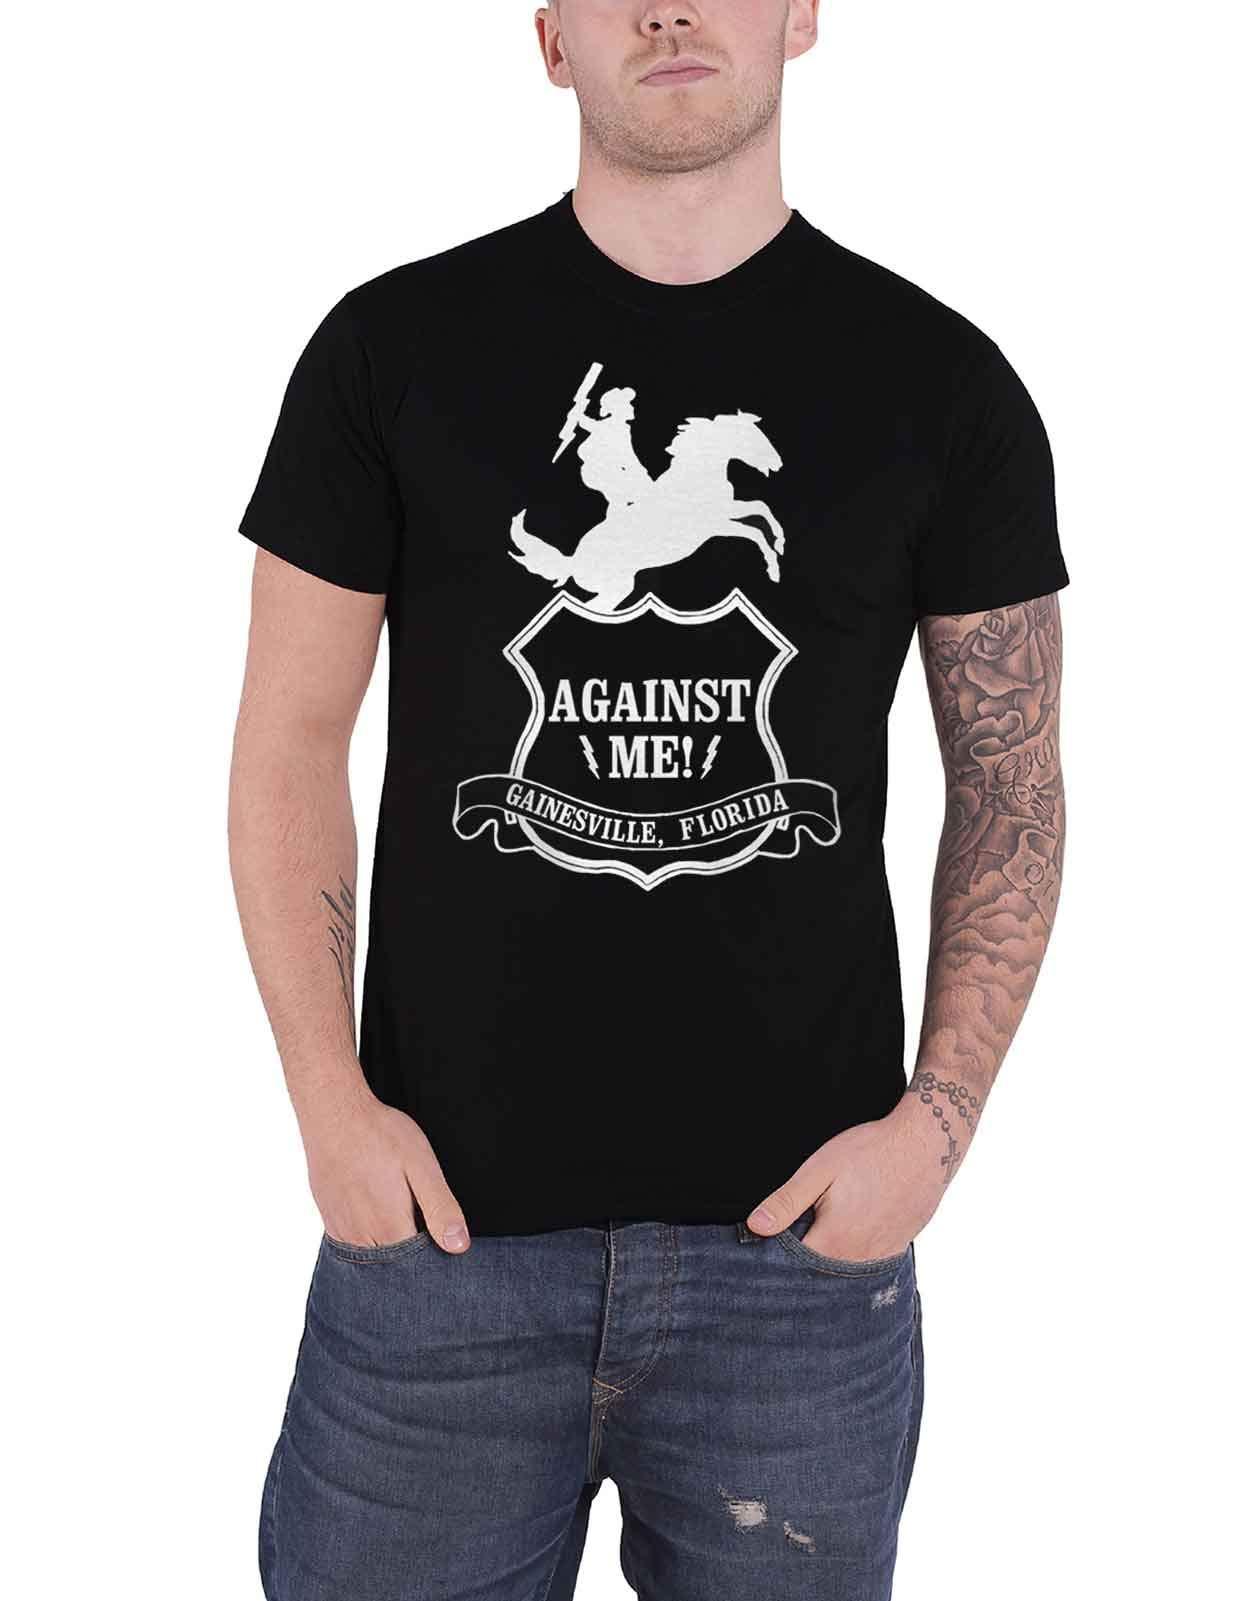 Against Me! T Shirt Cowboy Band Logo Punk Official Mens Black